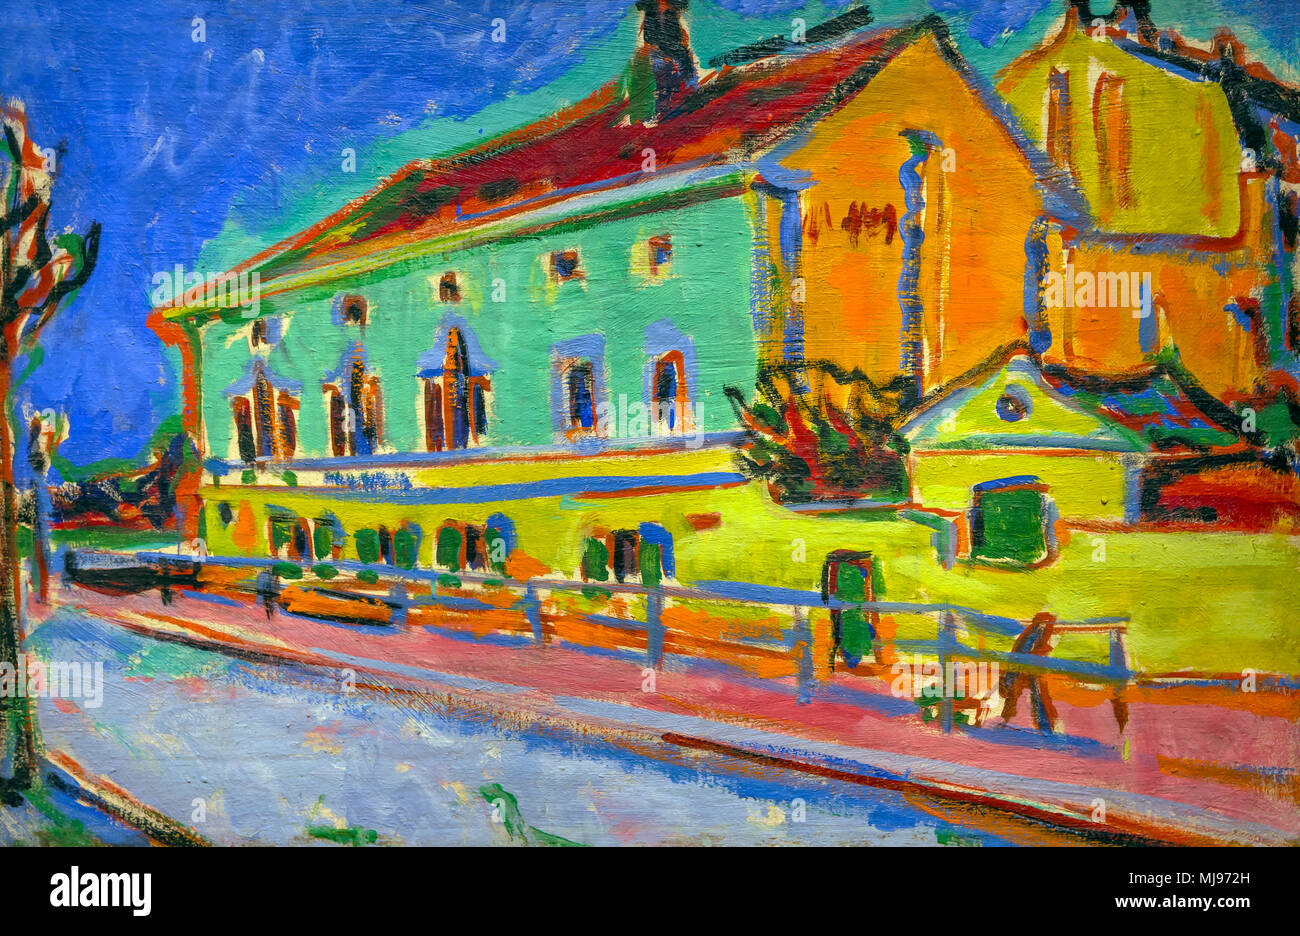 Dance Hall Bellevue, Ernst Ludwig Kirchner, 1909-1910, National Gallery of Art, Washington DC, USA, North America - Stock Image